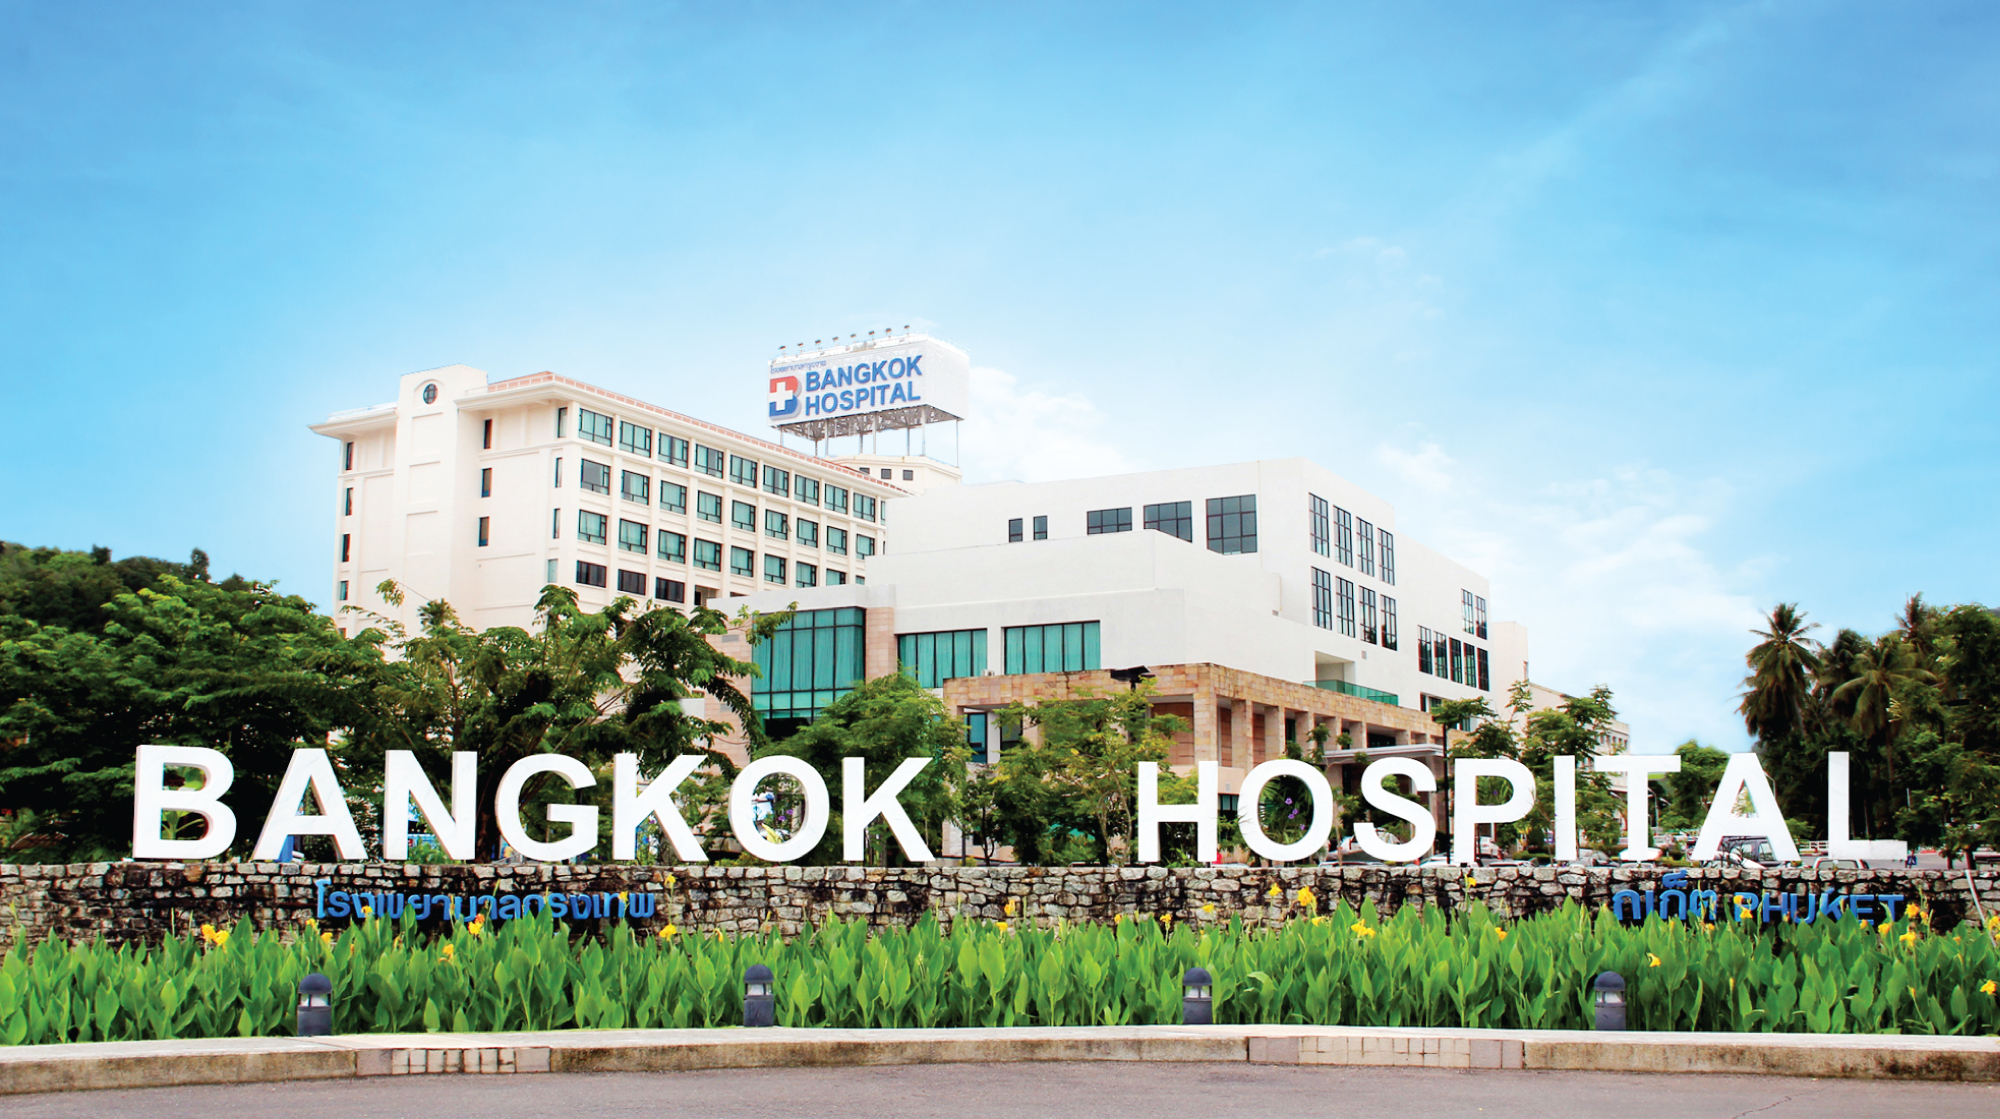 Bangkok Hospital (Phuket)